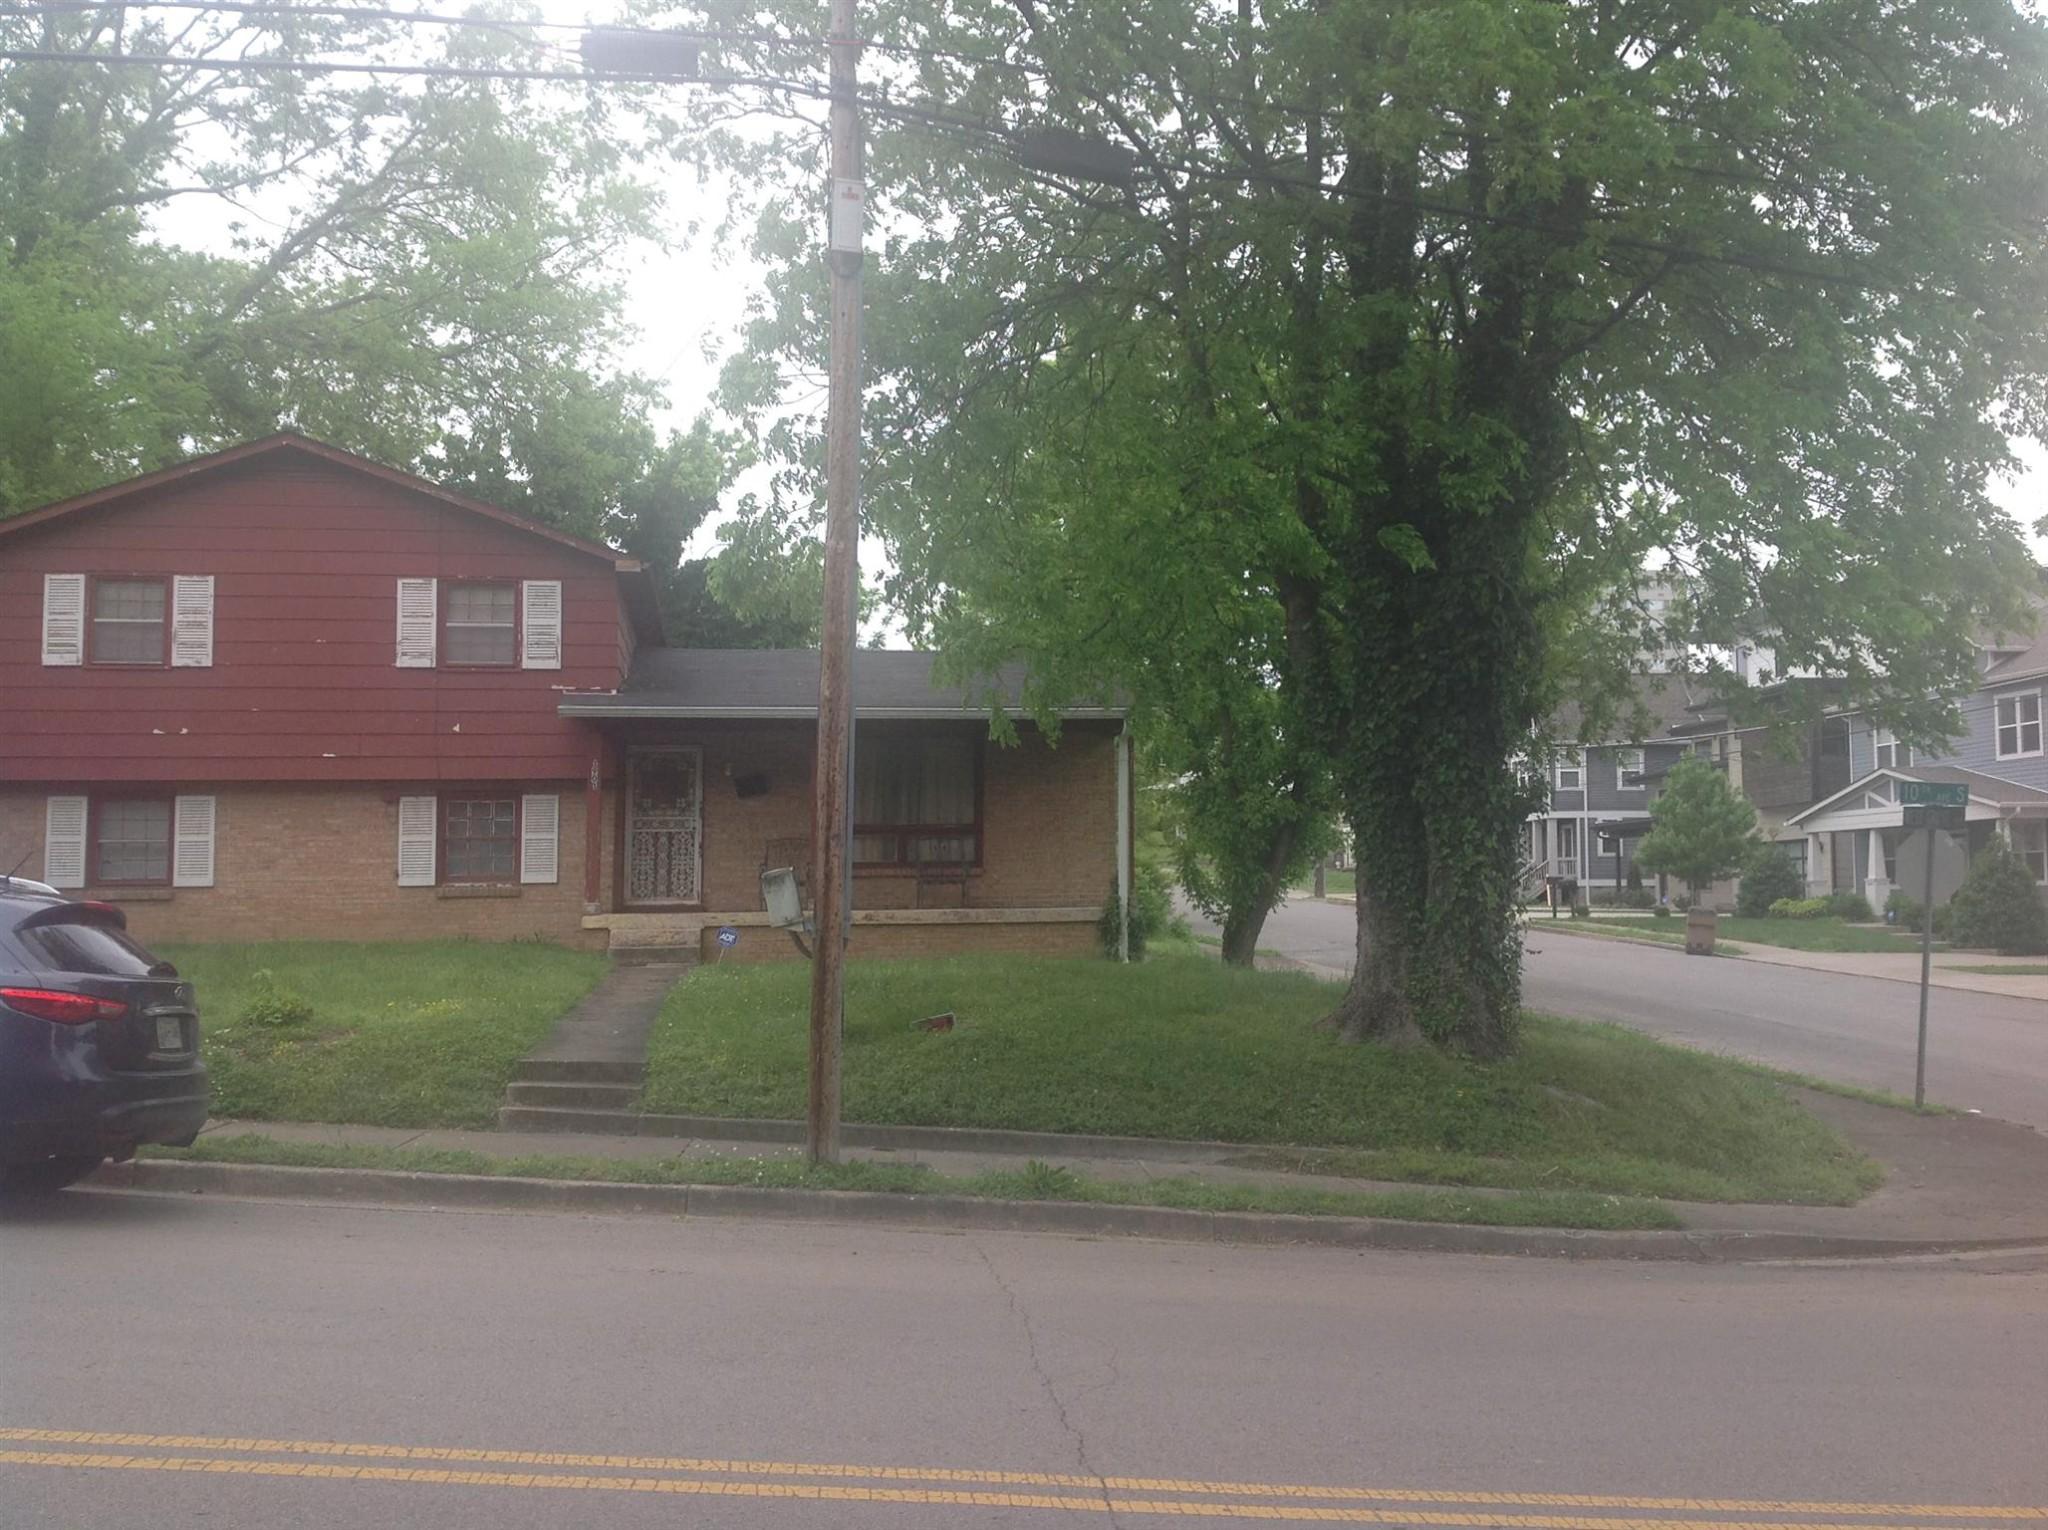 1901 10th Ave, S, Nashville, TN 37203 - Nashville, TN real estate listing